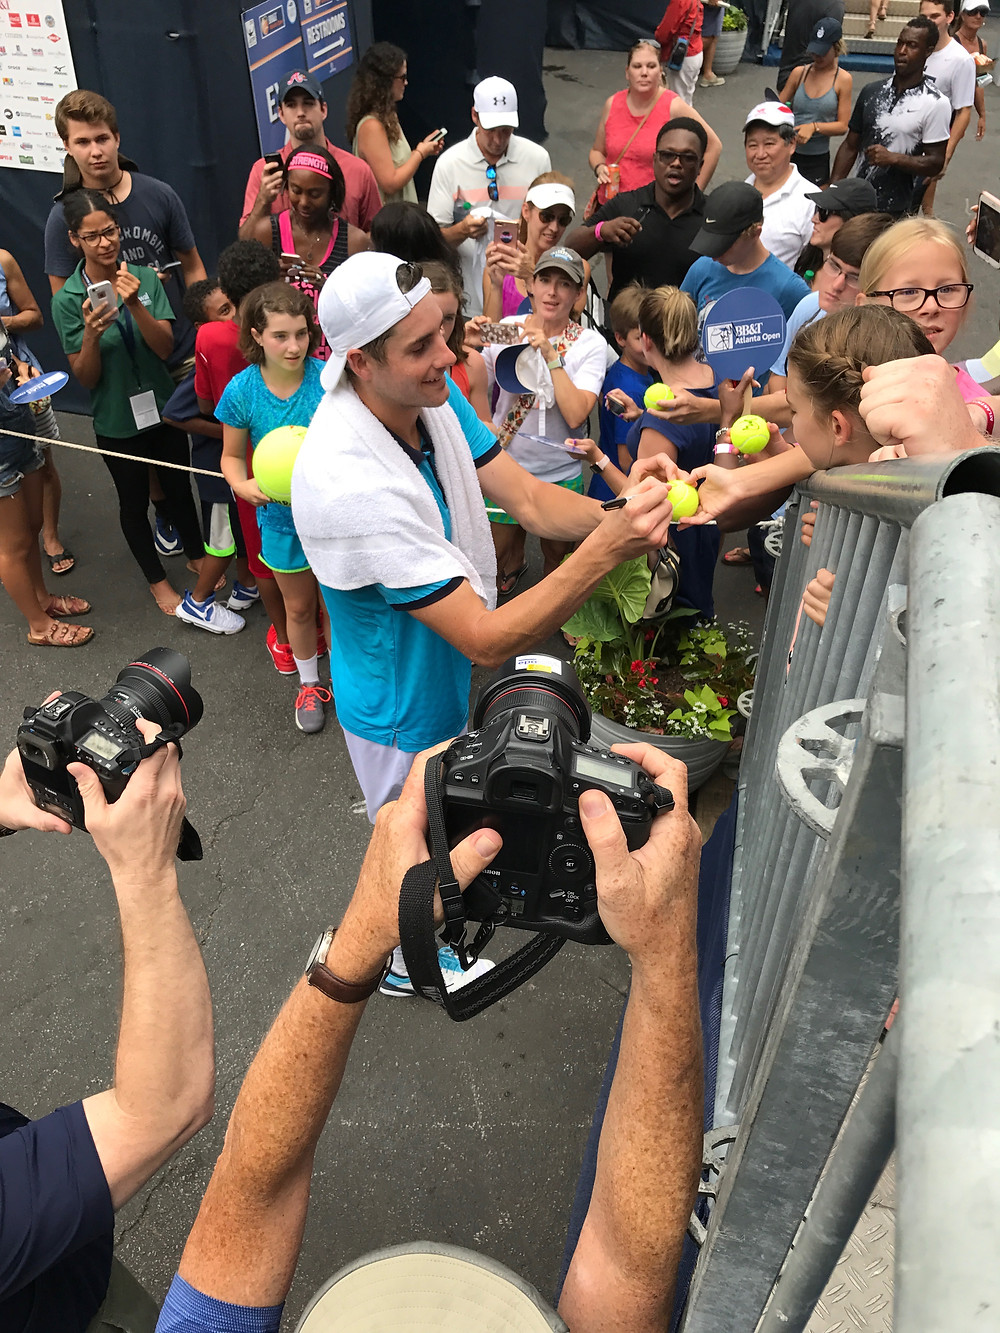 John Isner signing tennis balls after a win at the BB&T Atlanta Open